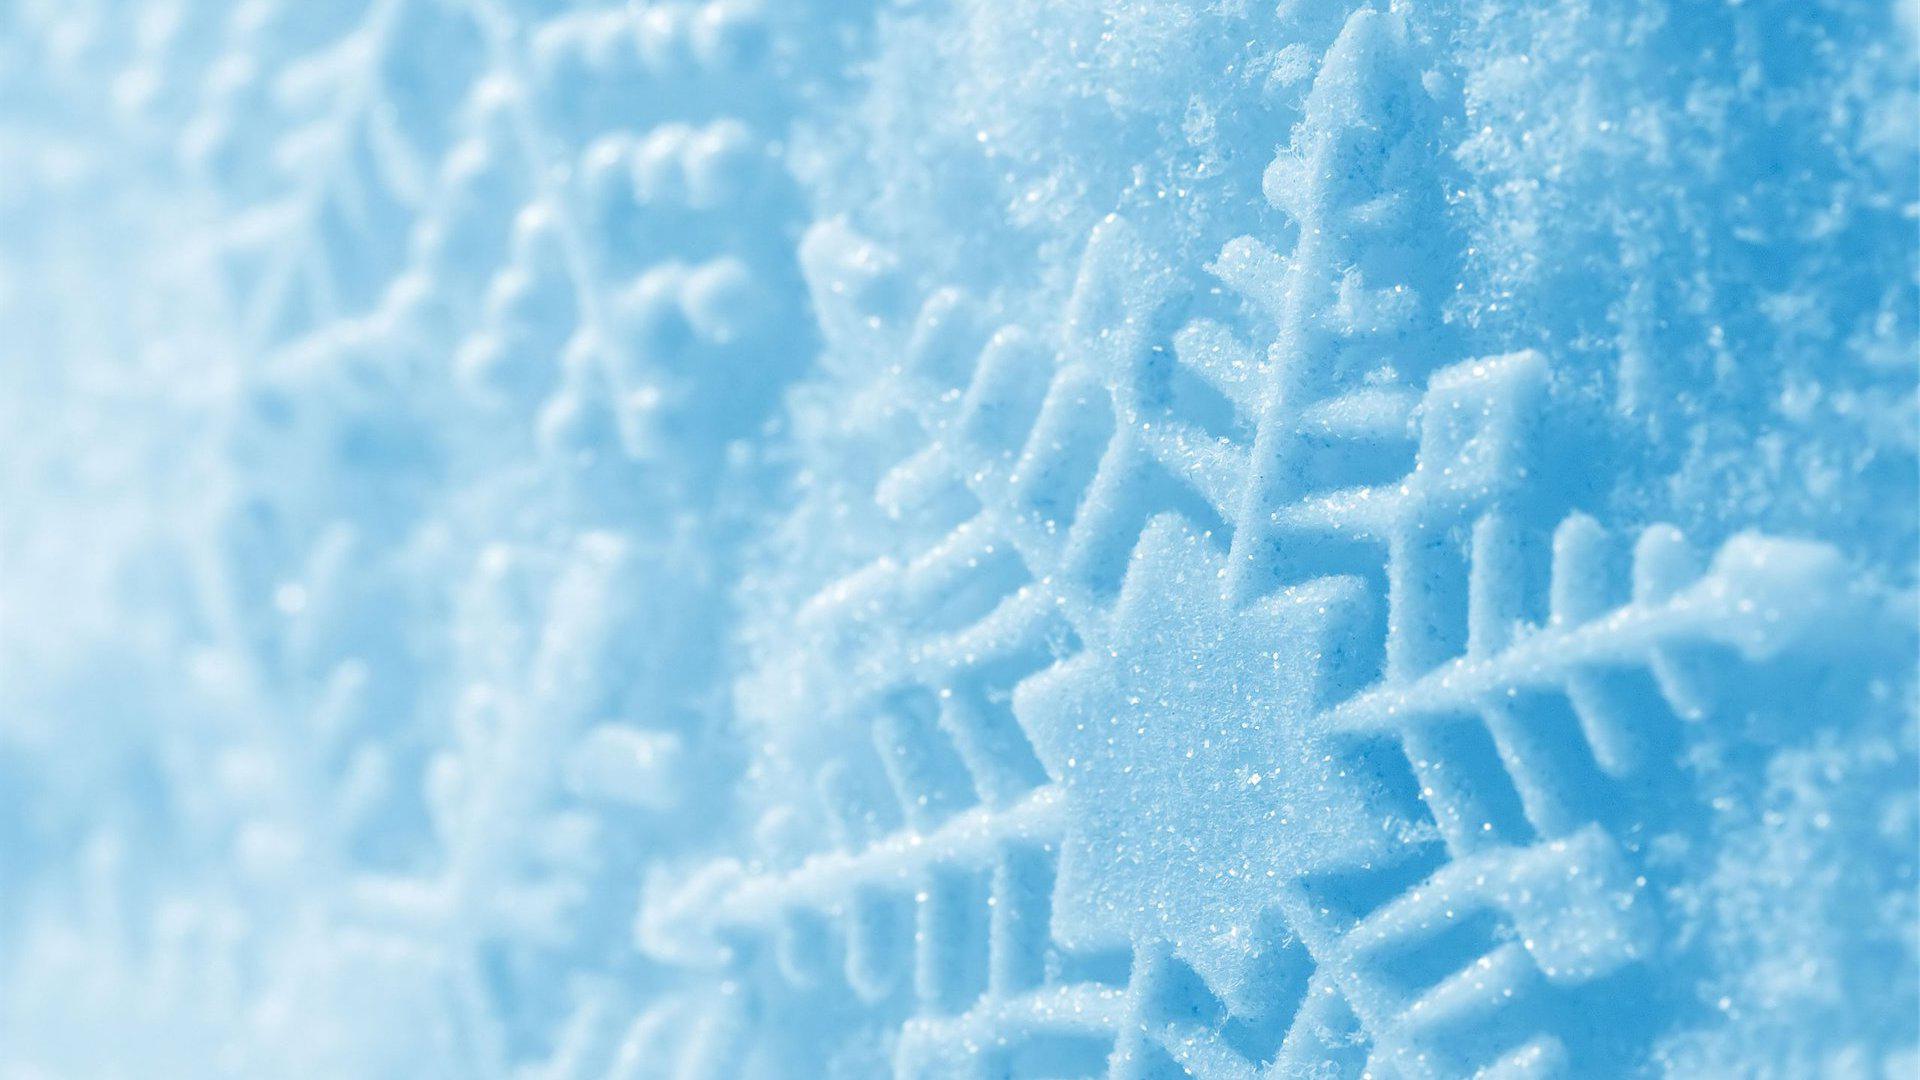 <p>Снежинка</p>